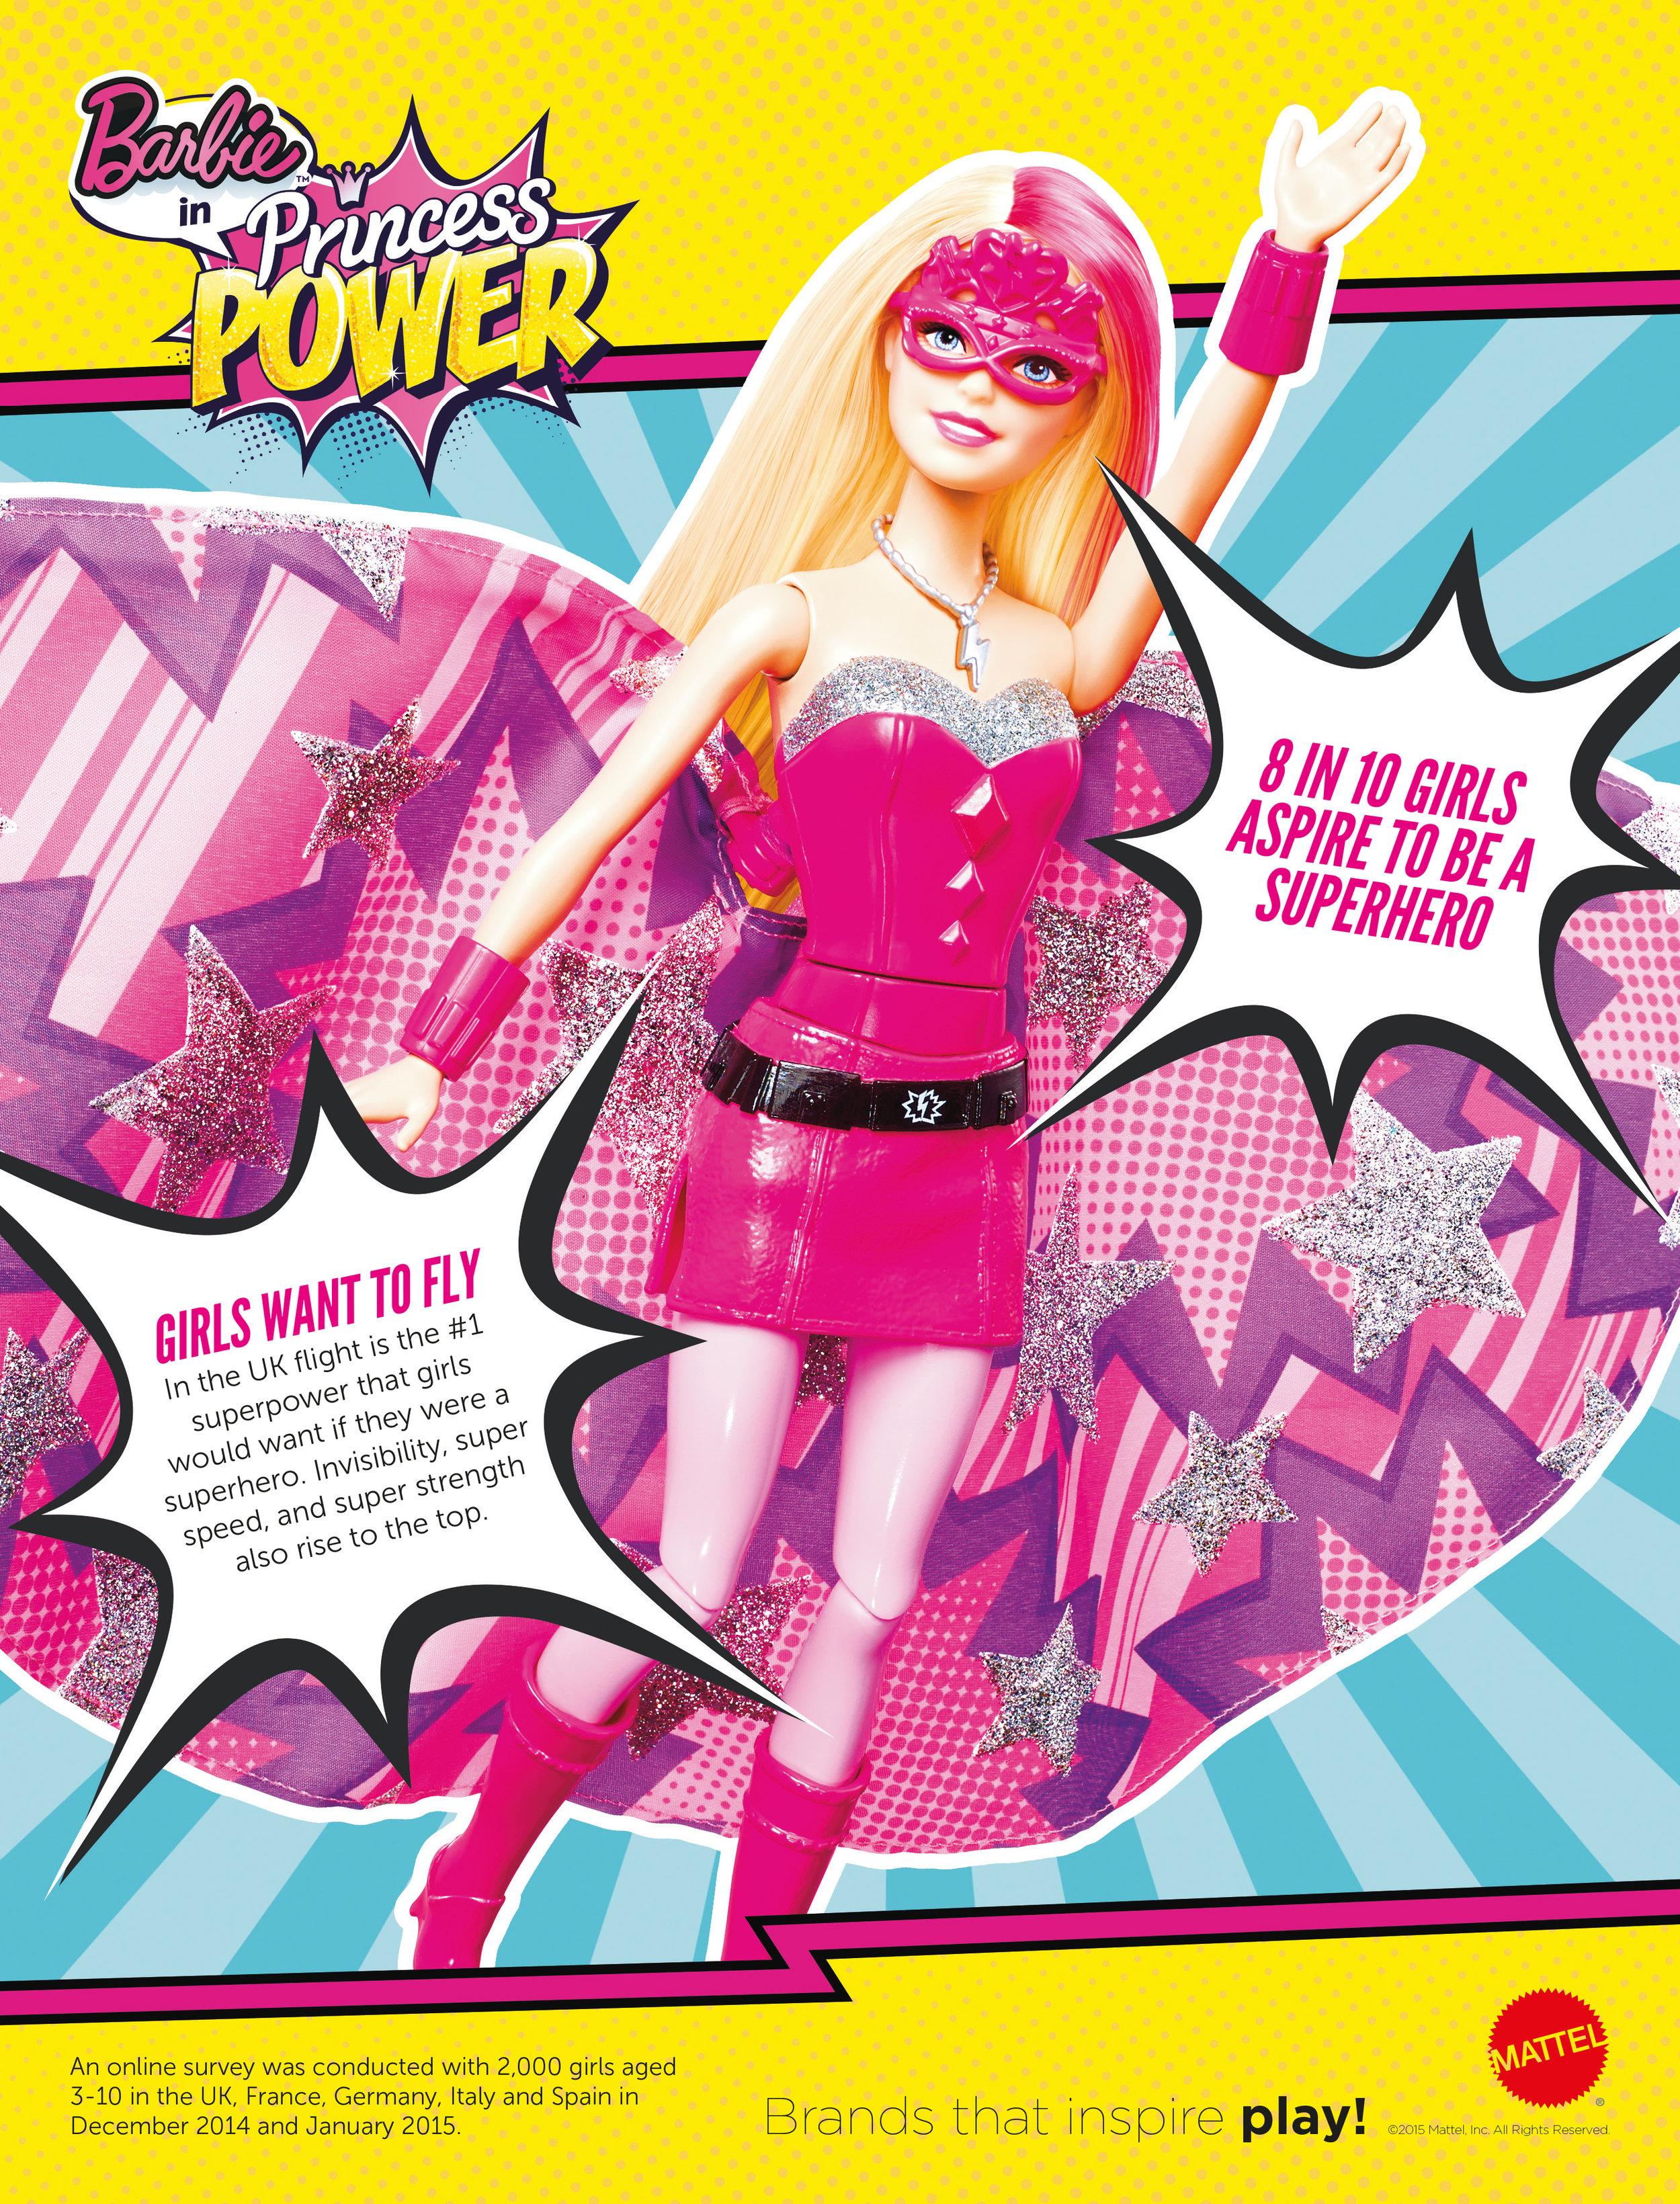 351804_Barbie_PrincessPower_ToyWorld_PressAd_Af.jpg